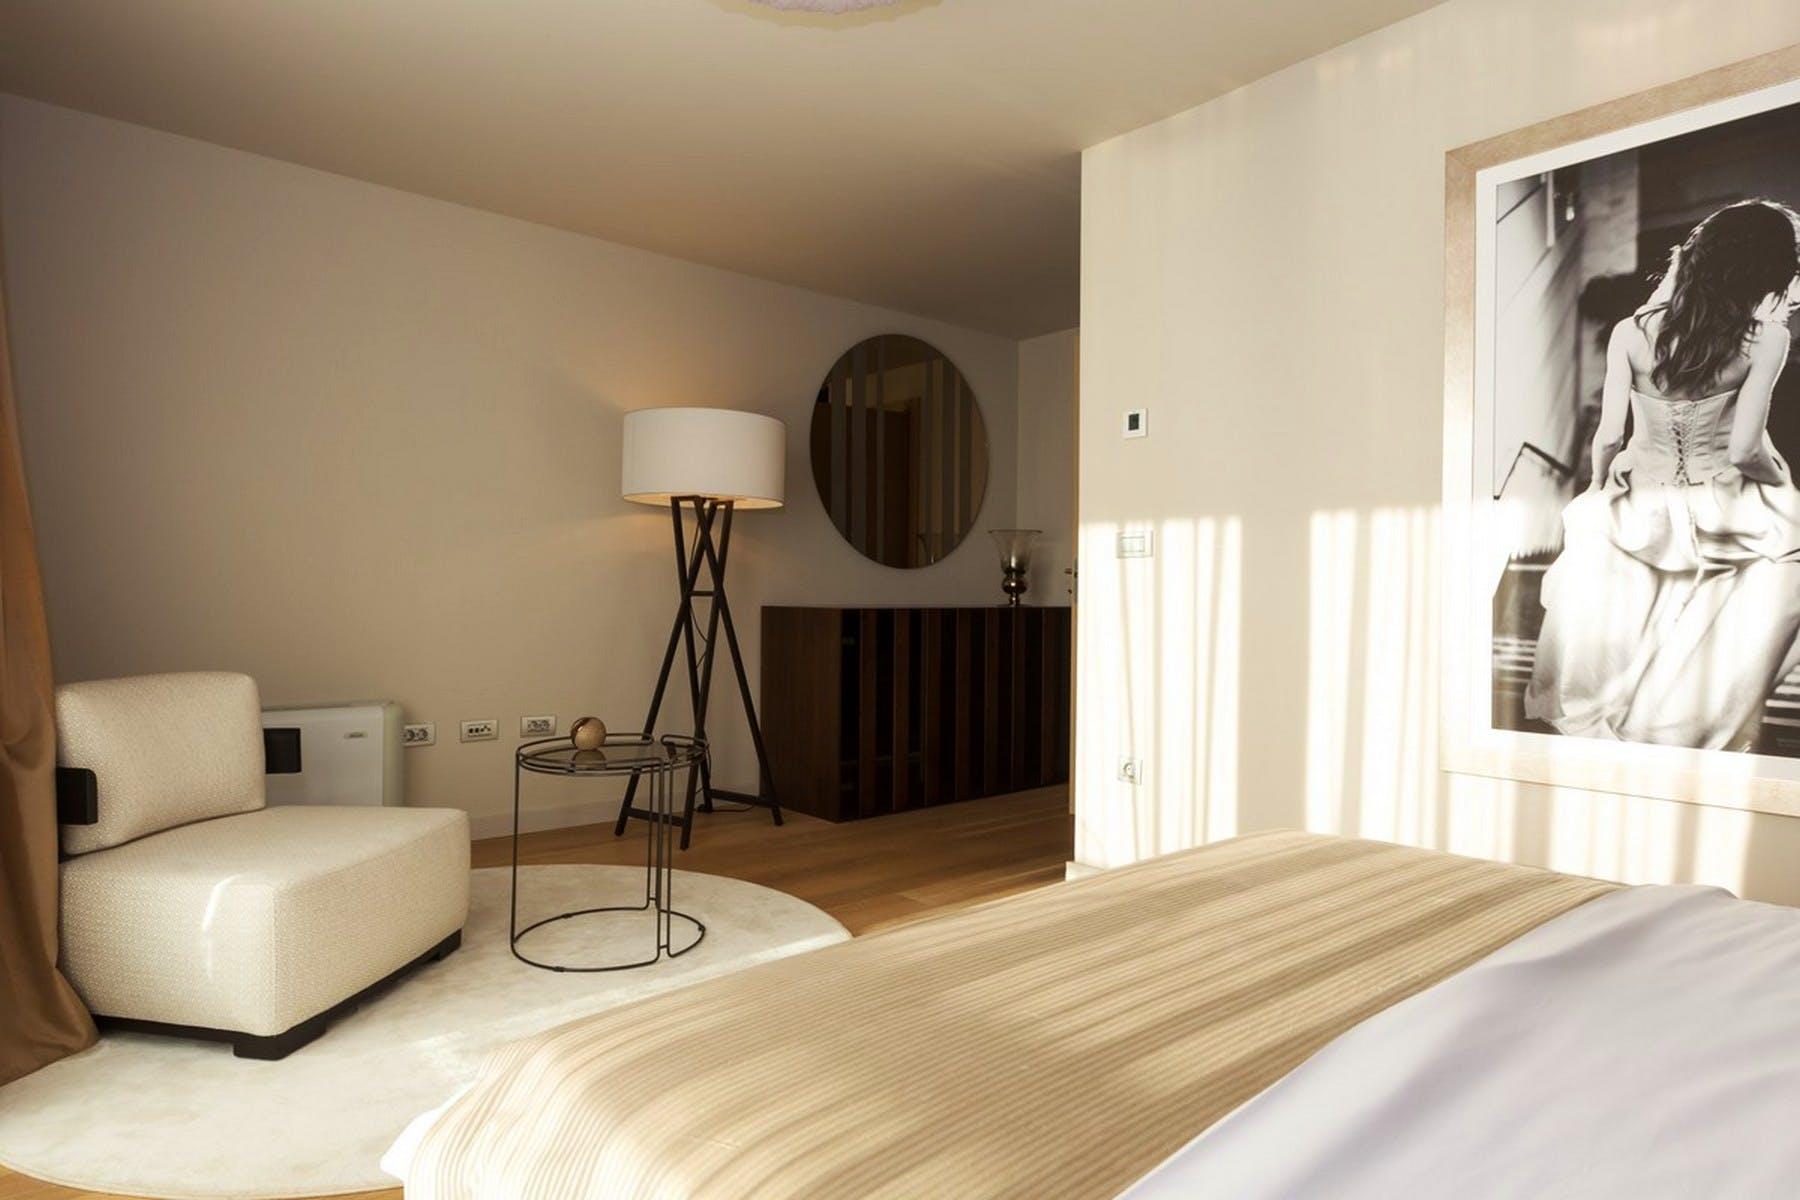 Interior design details in the master bedroom